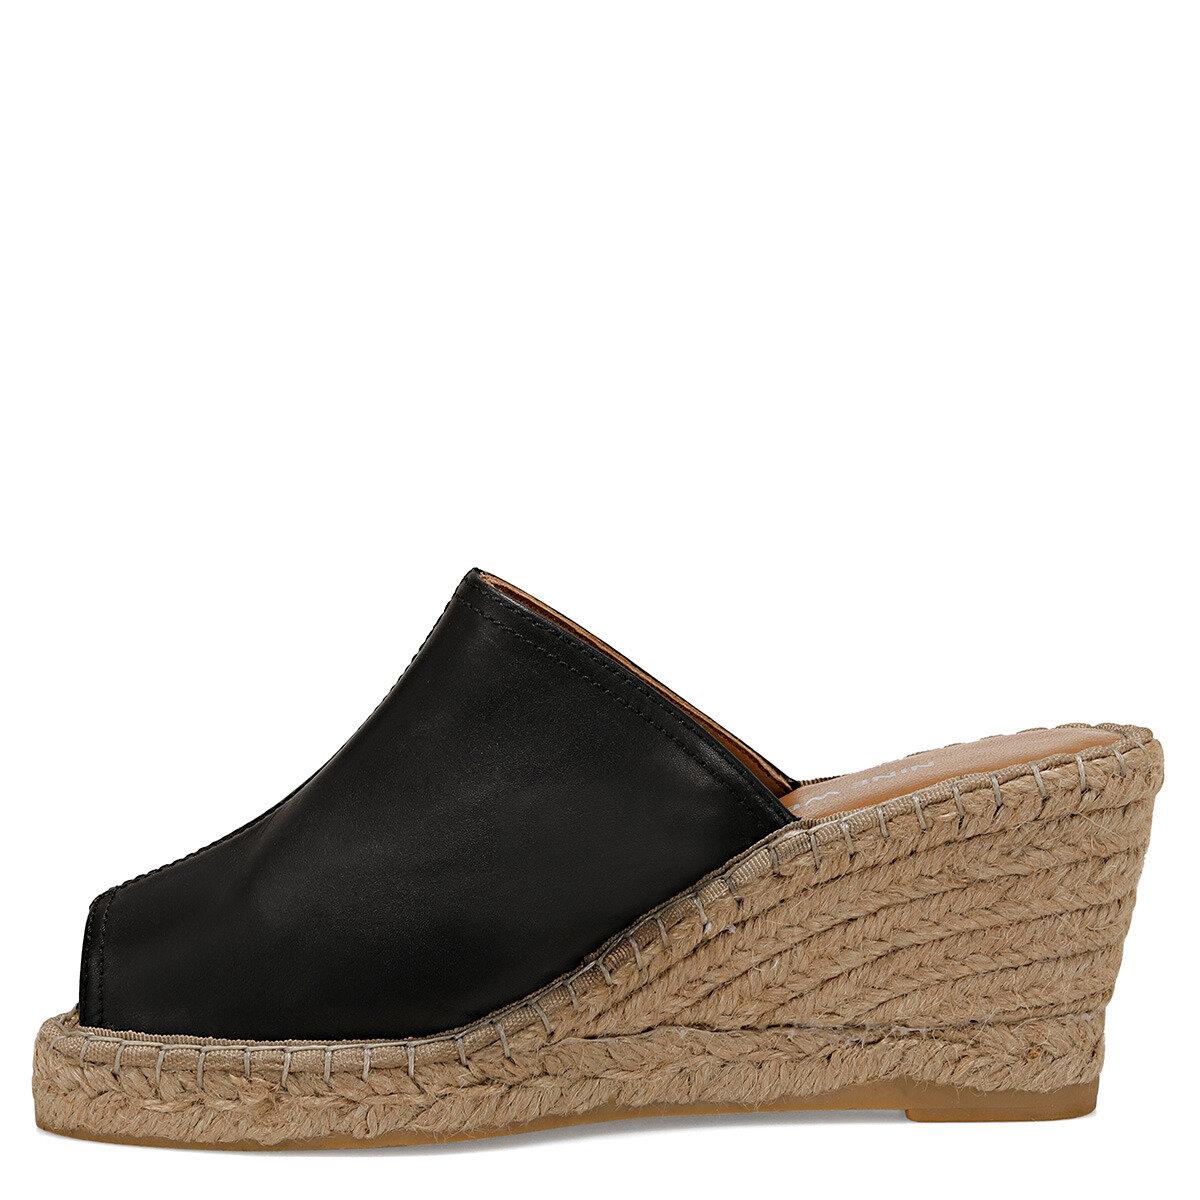 KAUFFMAN2 Siyah Kadın Dolgu Topuklu Sandalet